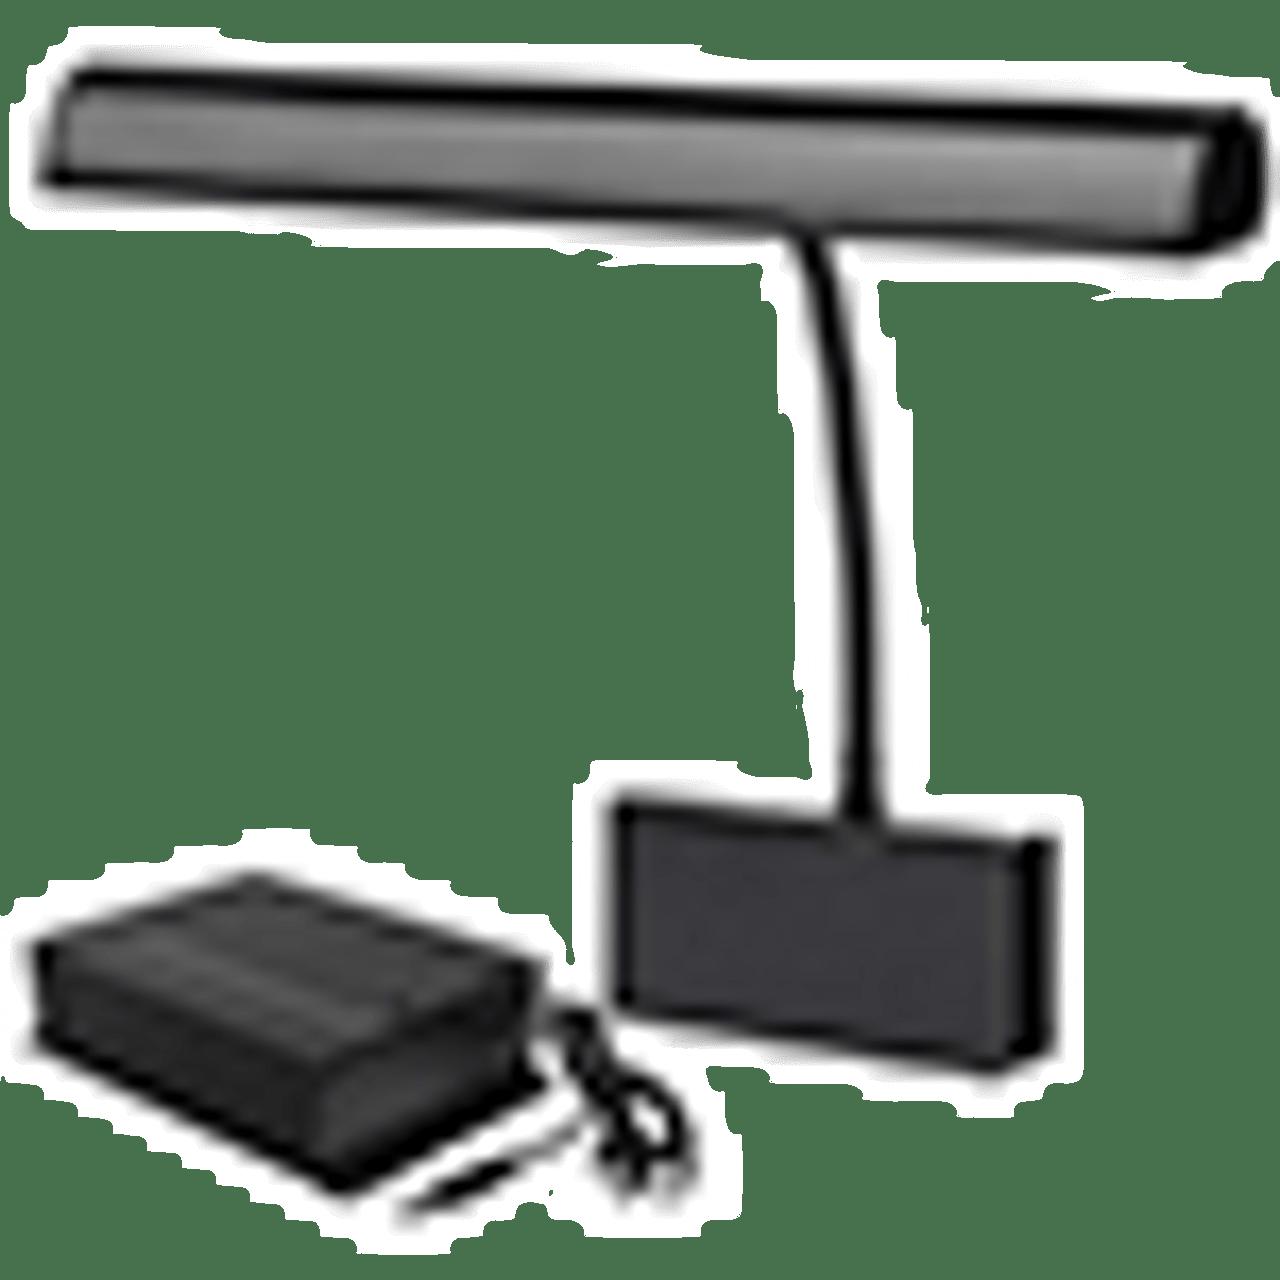 Cordless Piano Lamps